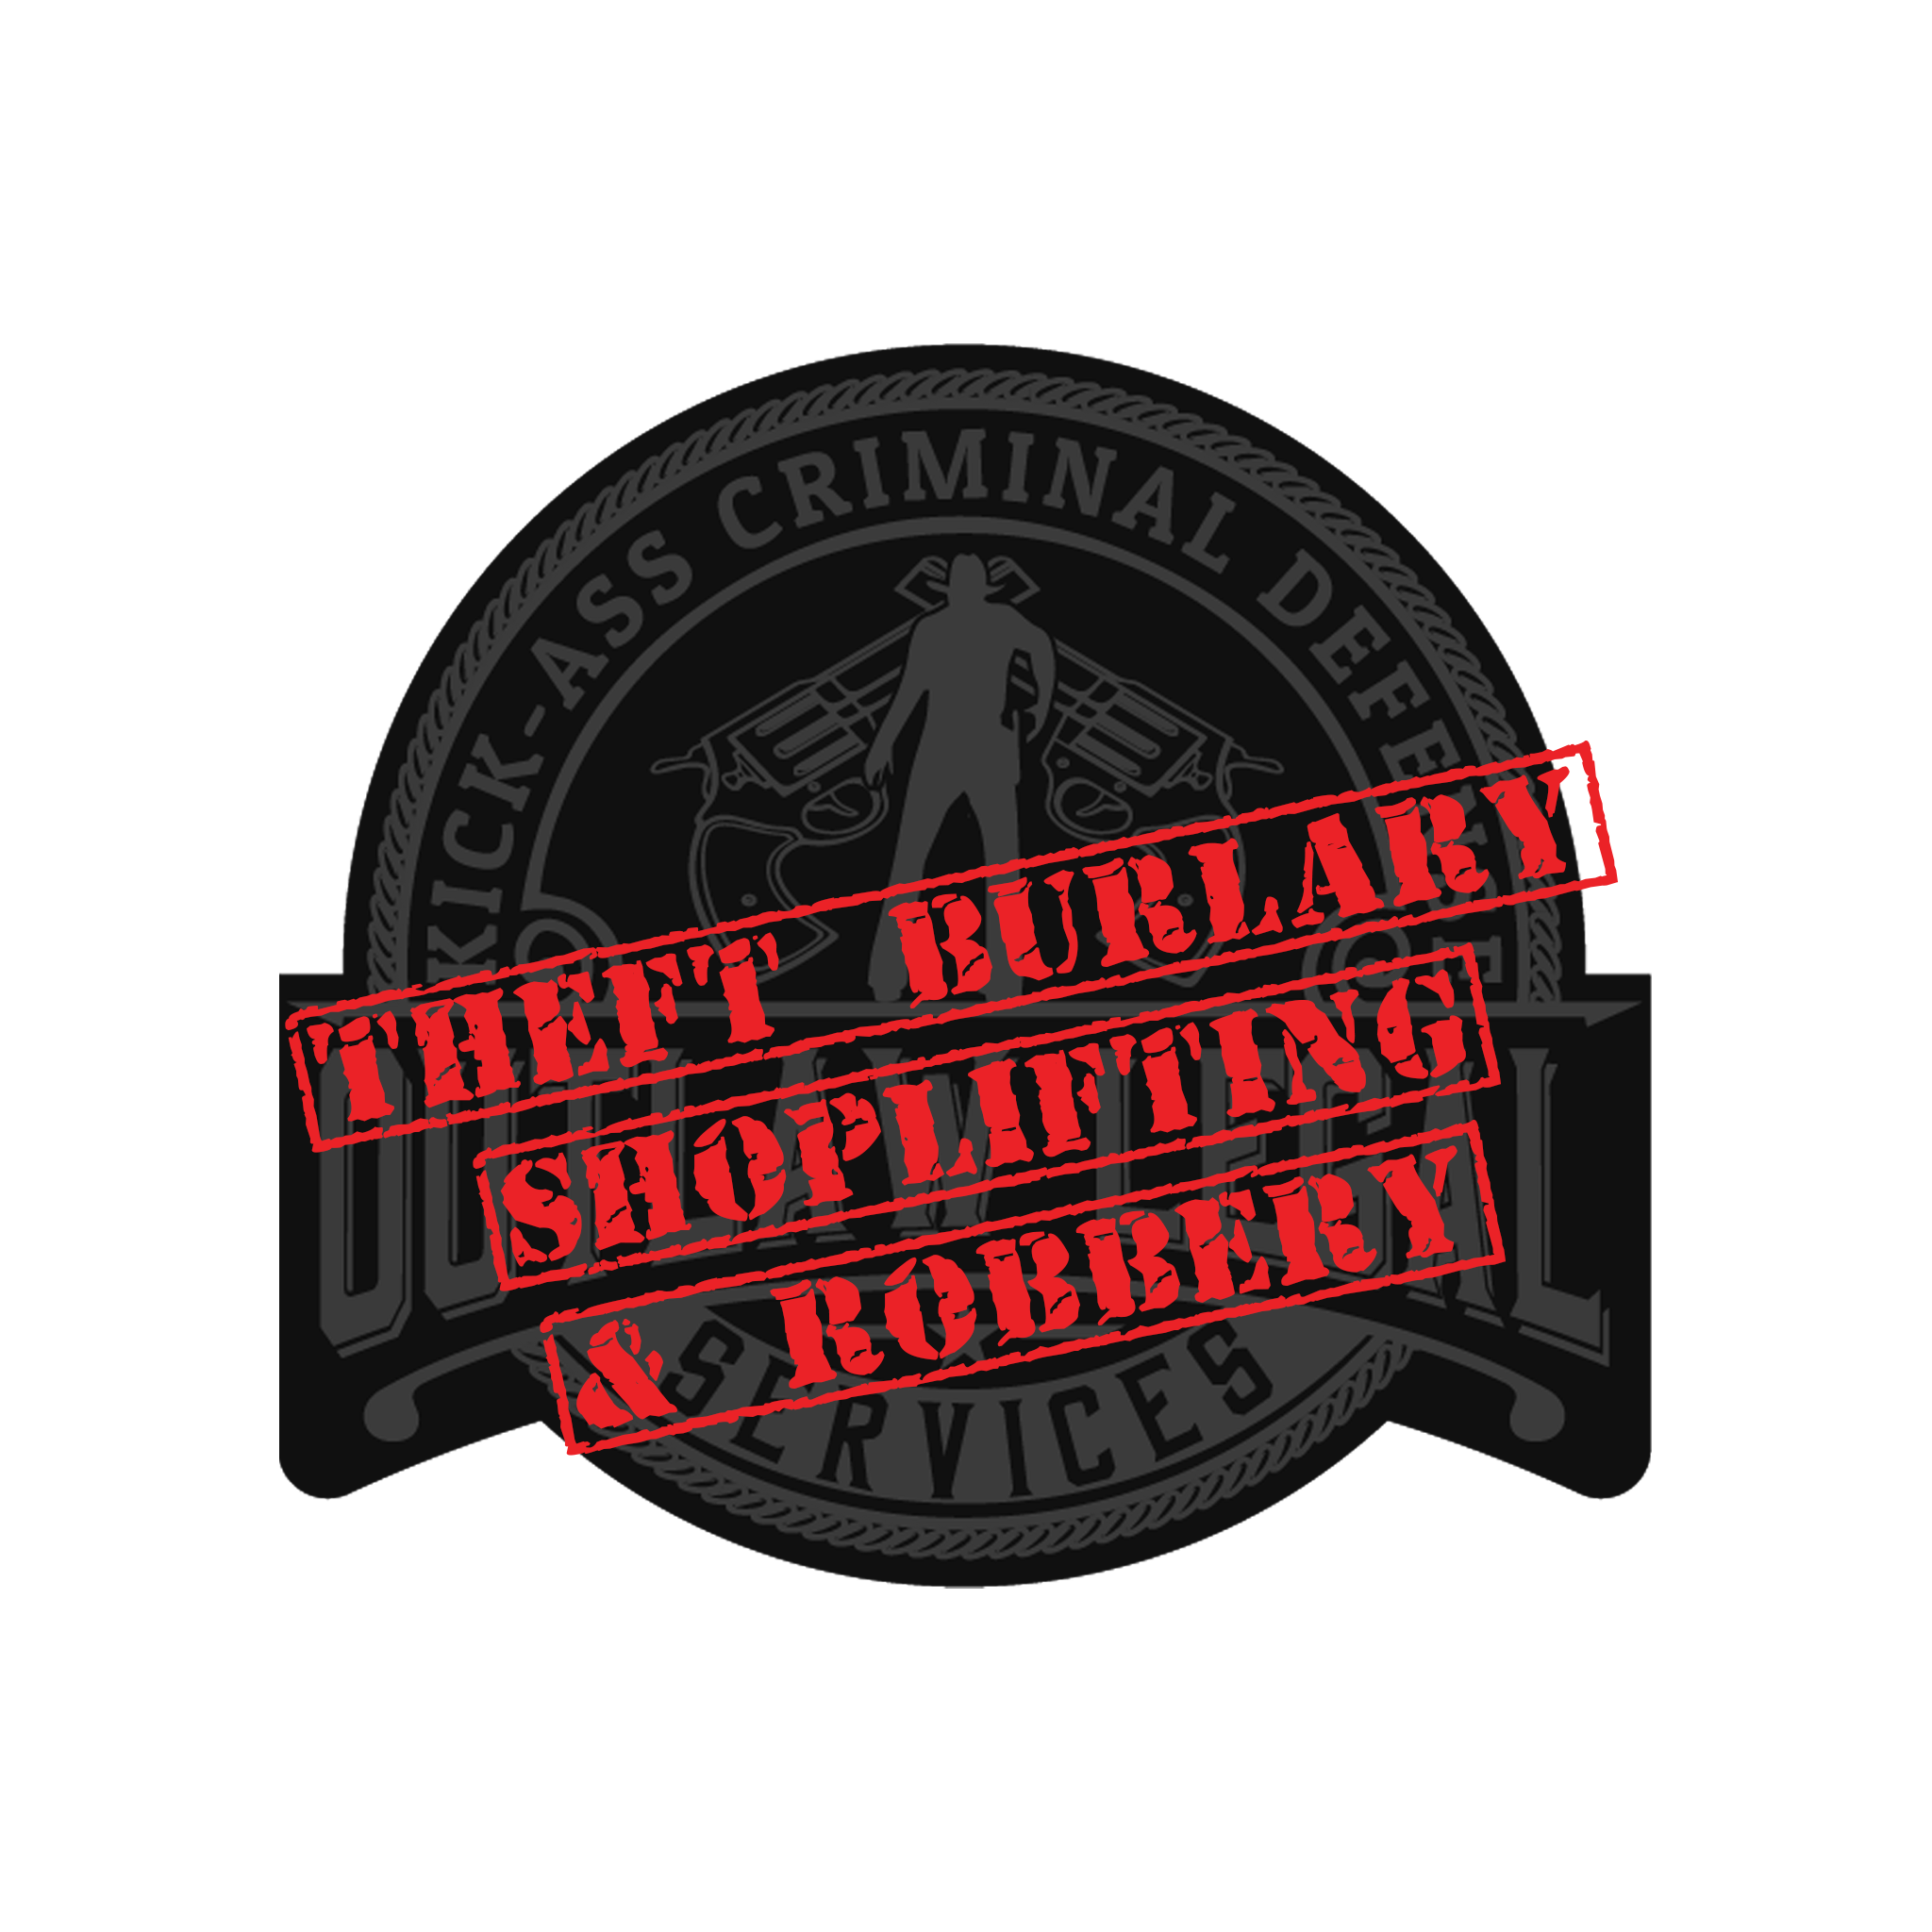 theft burglary shoplifting robbery Criminal Defense Attorney Lawyer Utah slat lake city provo ogden